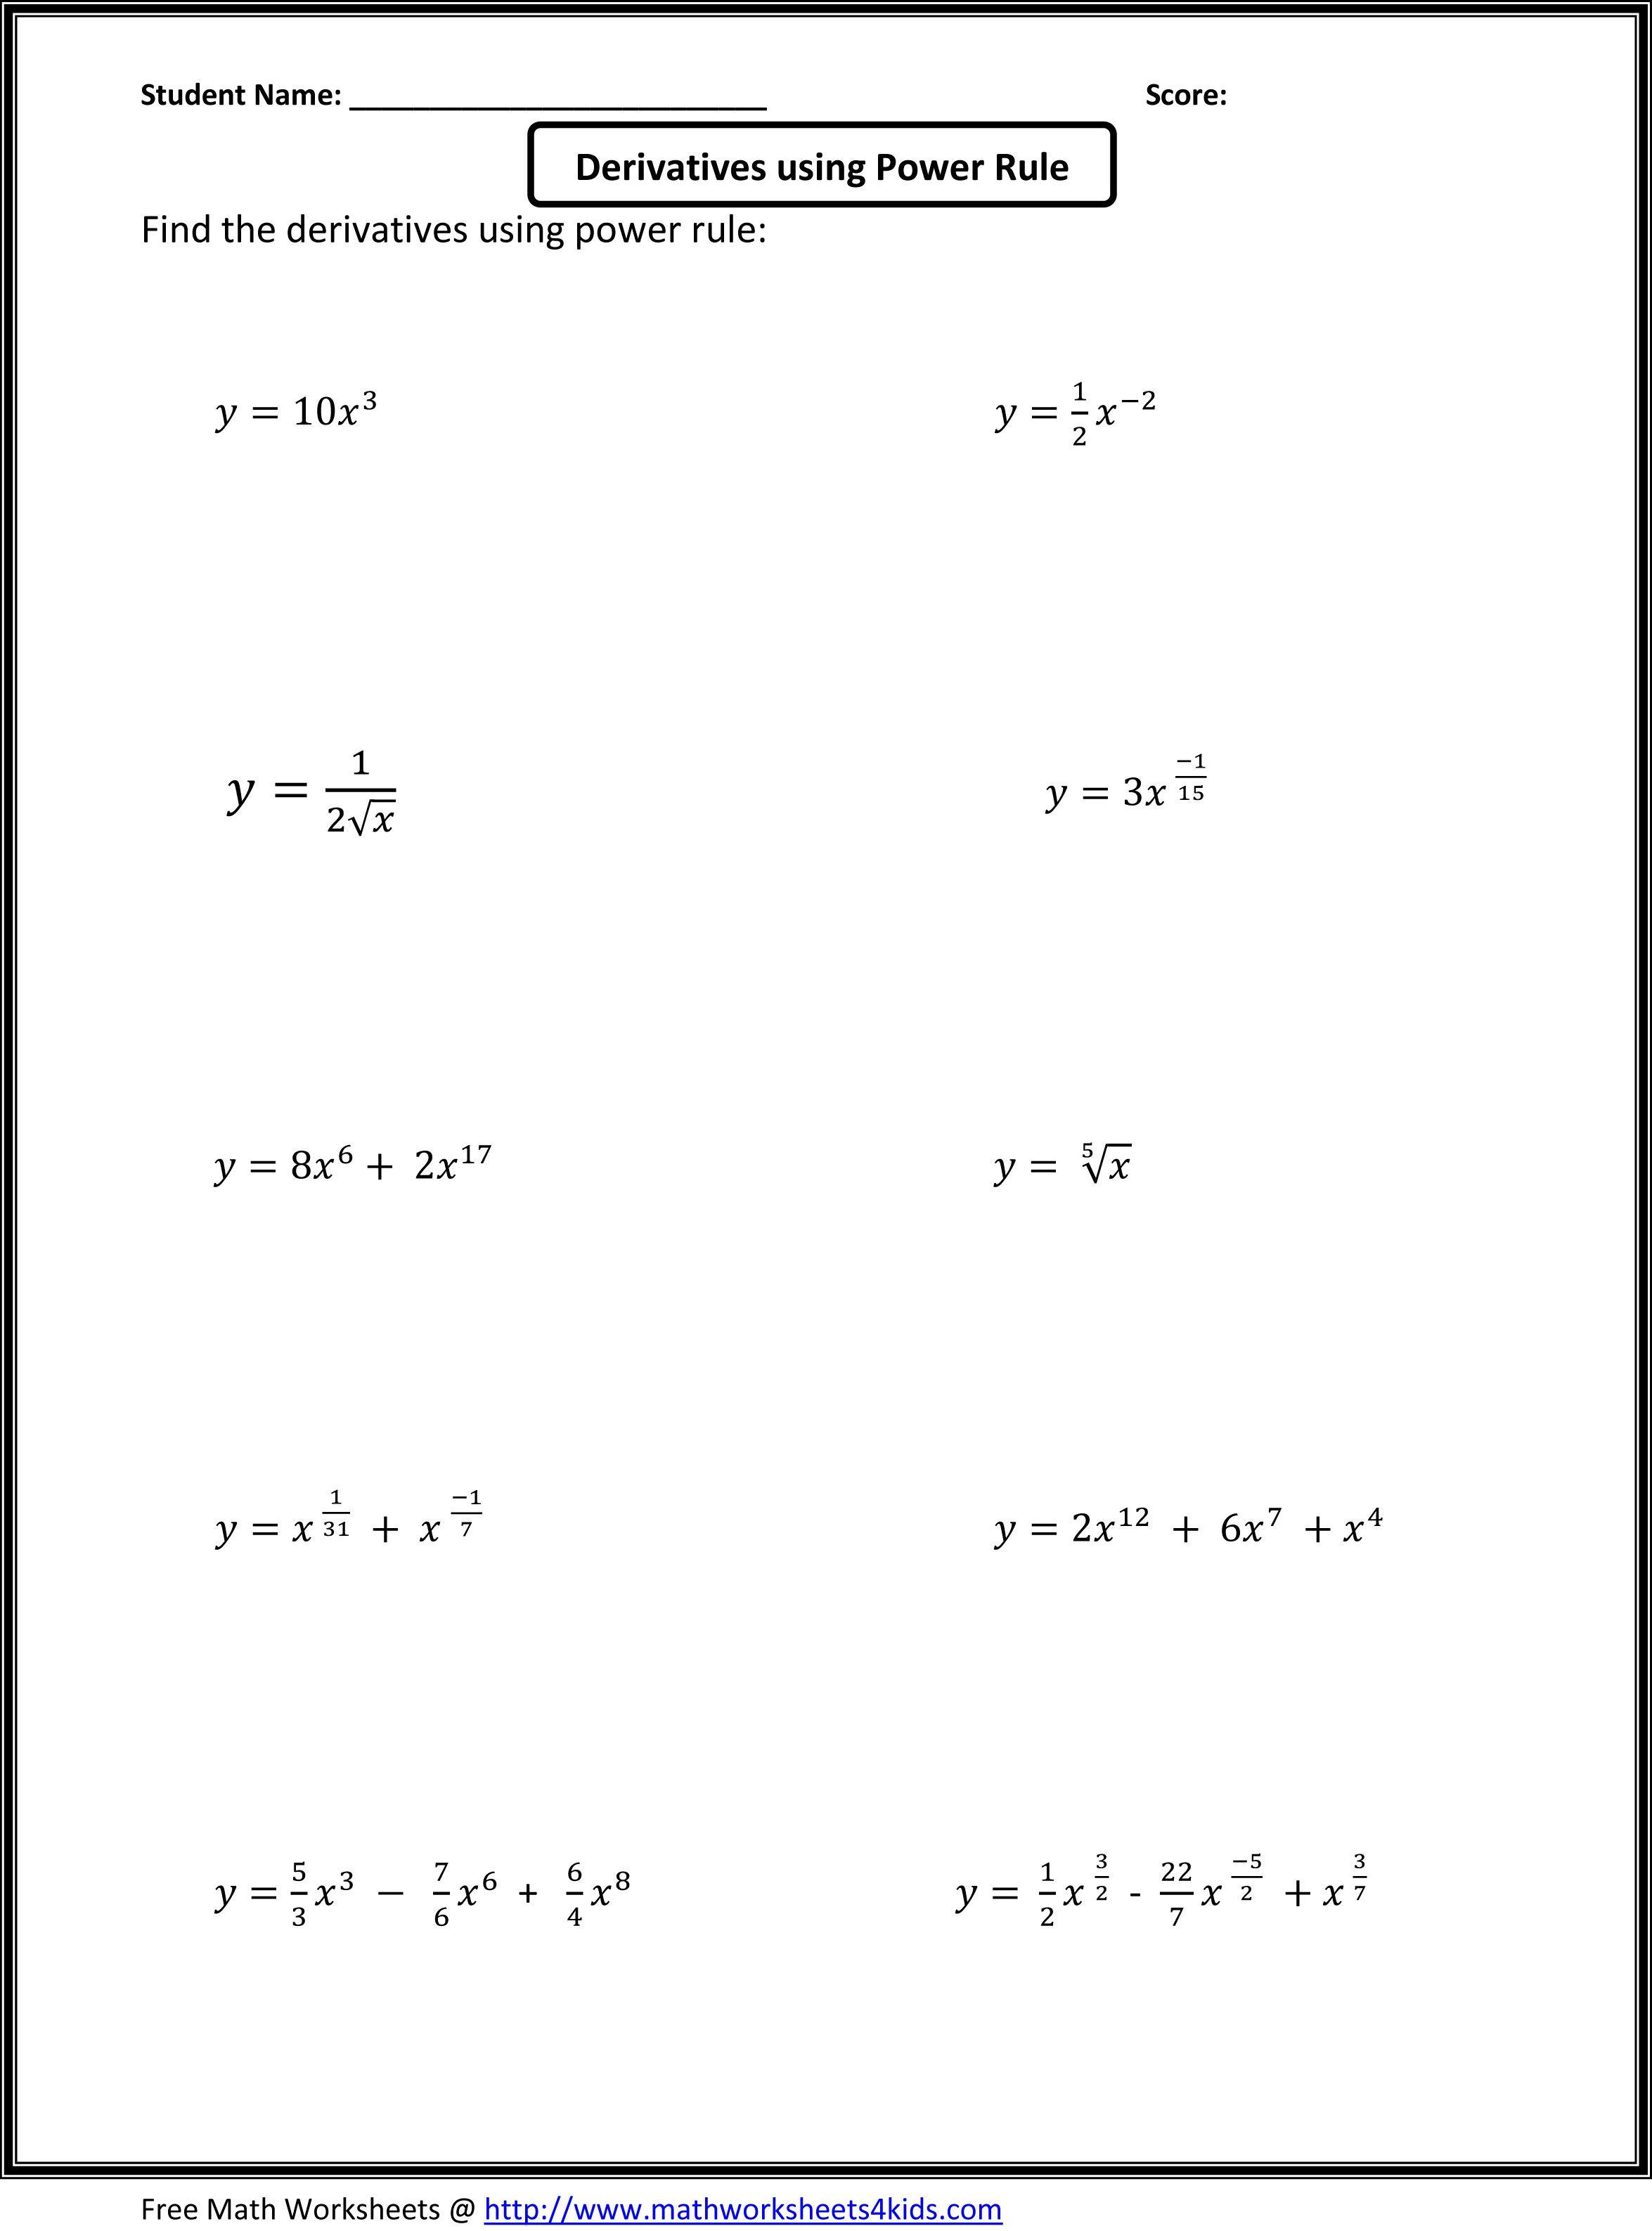 13 Best Polynomials Worksheets Images On Best Worksheets